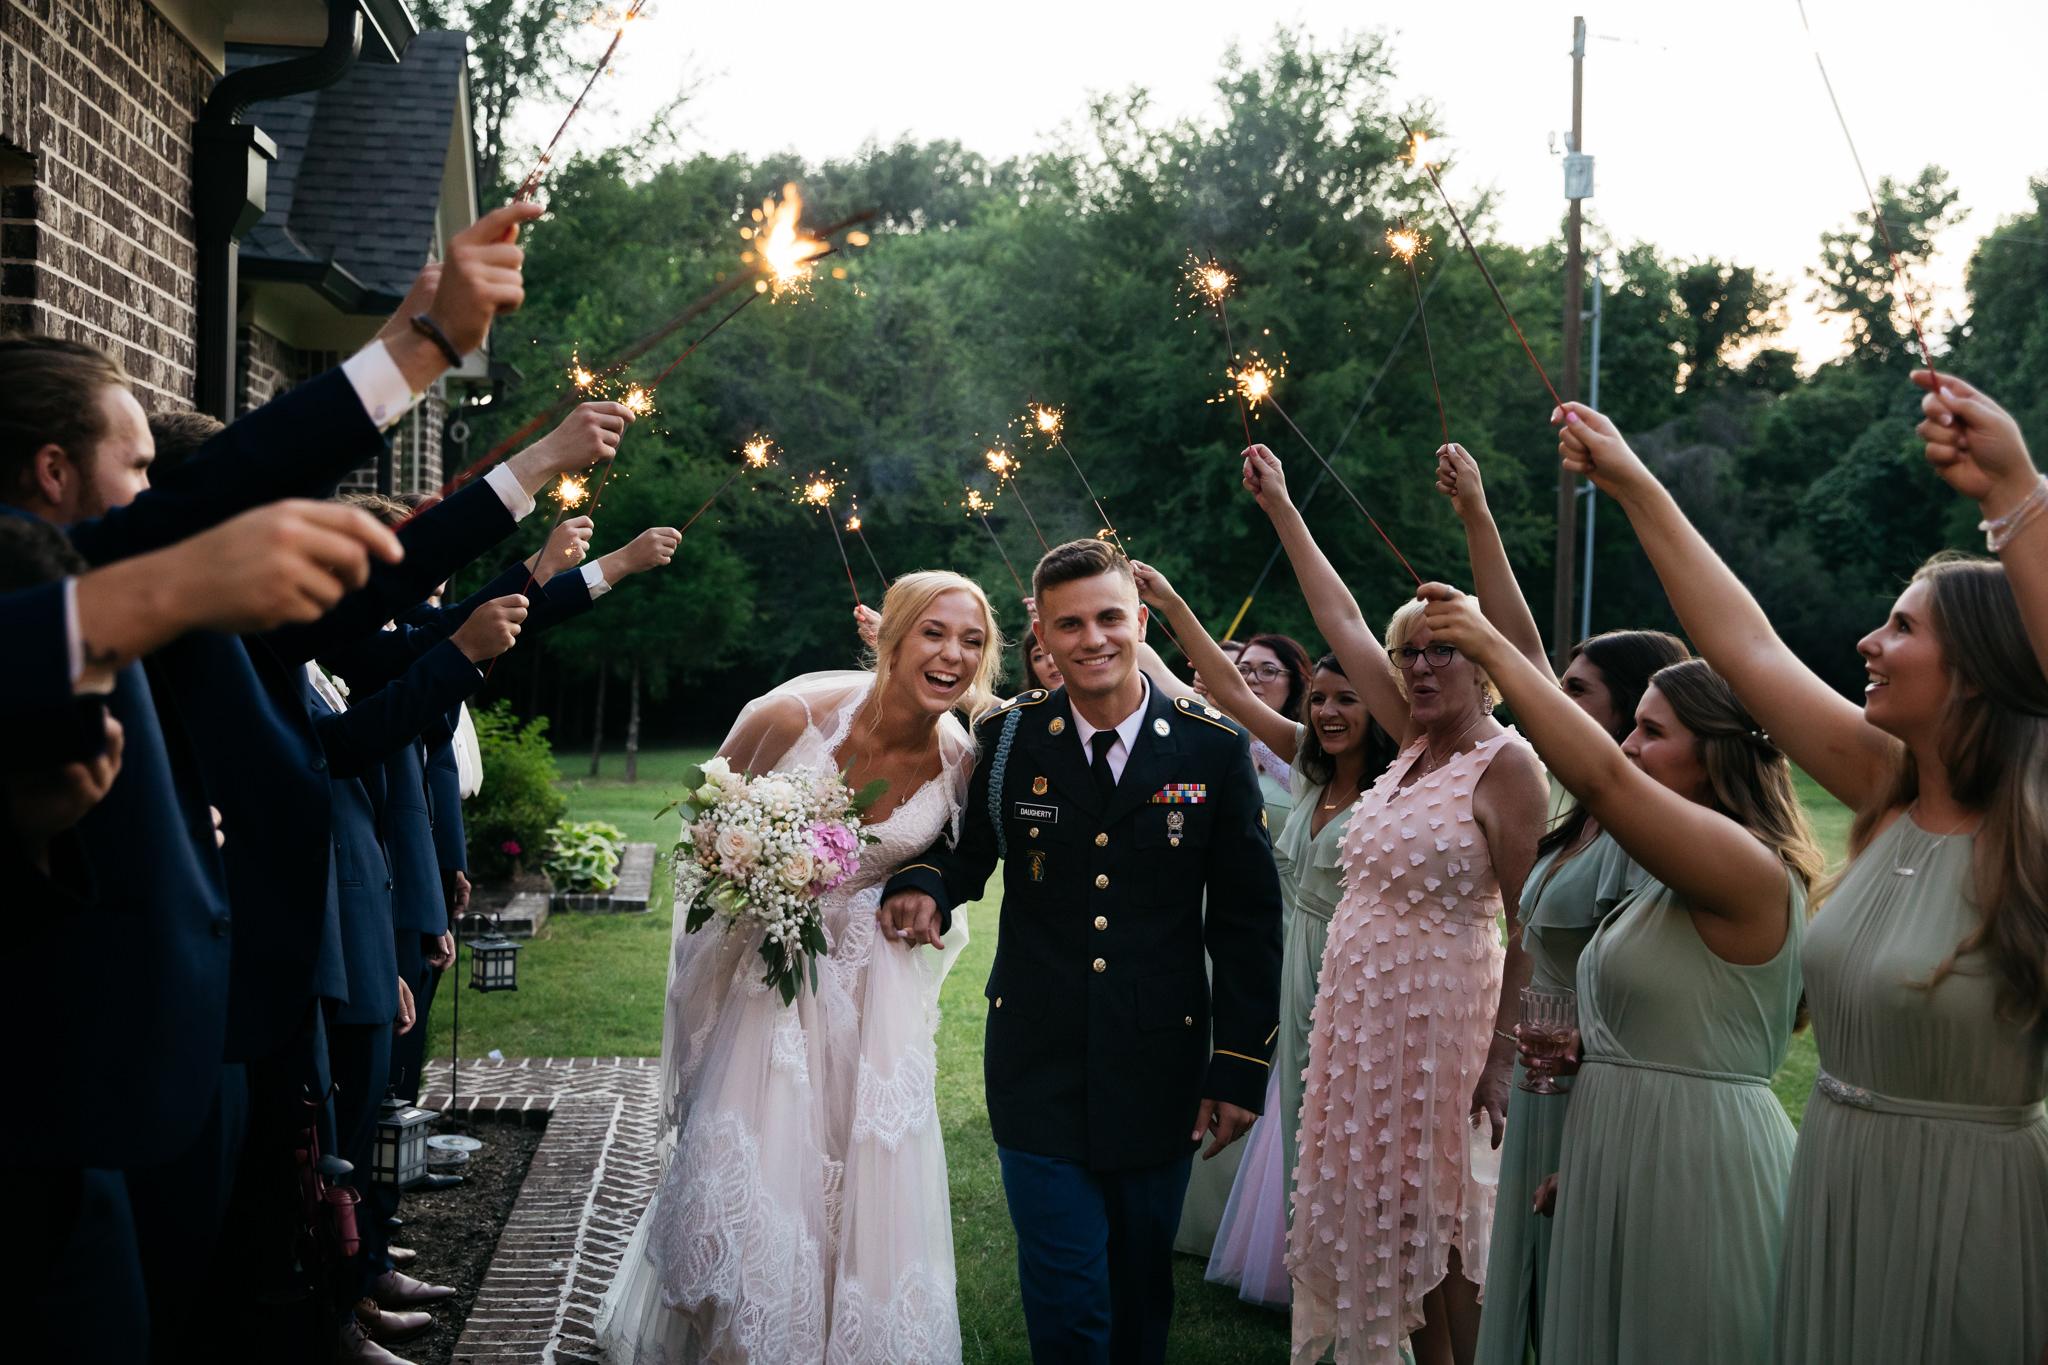 backyard-wedding-thewarmtharoundyou-lexy-branson-7-2.jpg